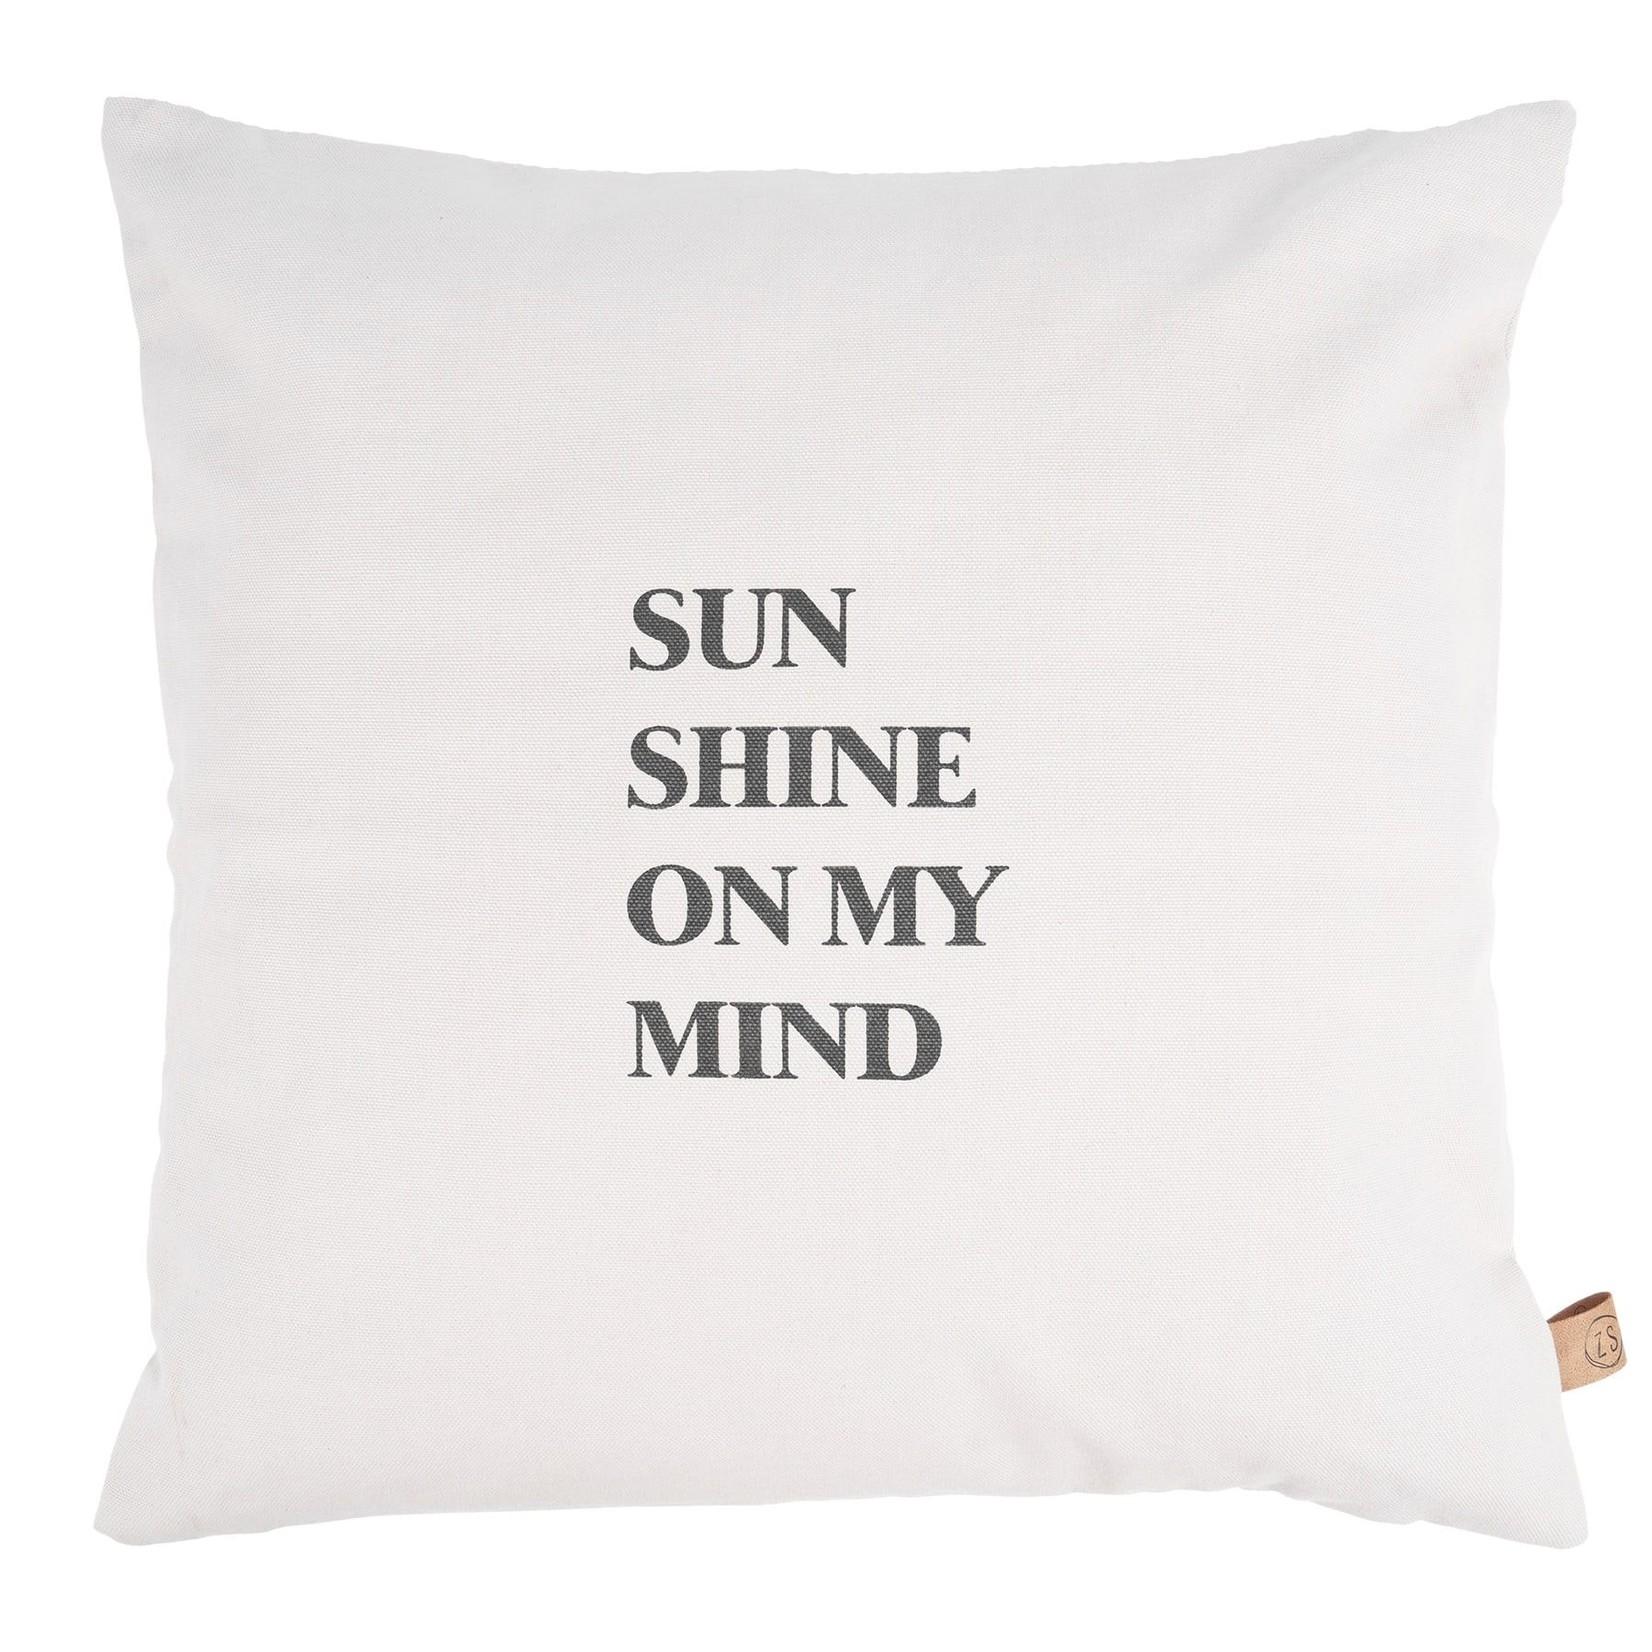 Buitenkussen sunshine 45x45cm zand Zussss